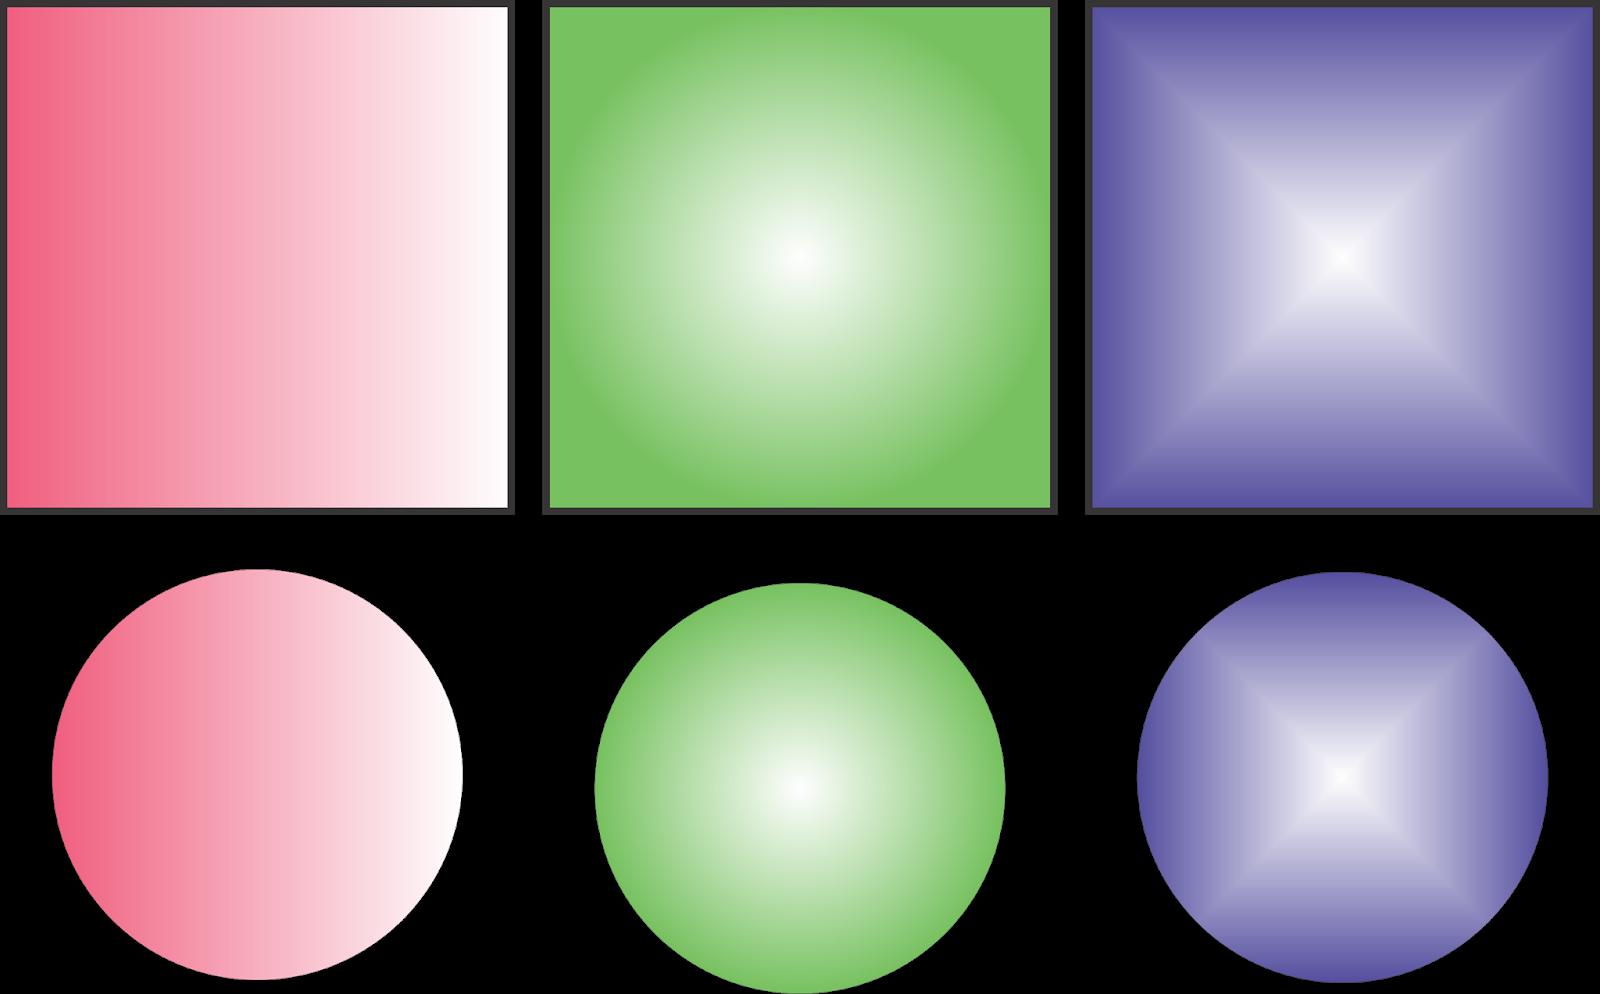 Selamat Berpetualang sobat kali ini saya akan berbagi cara mewarnai objek di CorelDraw X7 Pada dasarnya pewarnaan objek setiap generasi CorelDraw itu sama